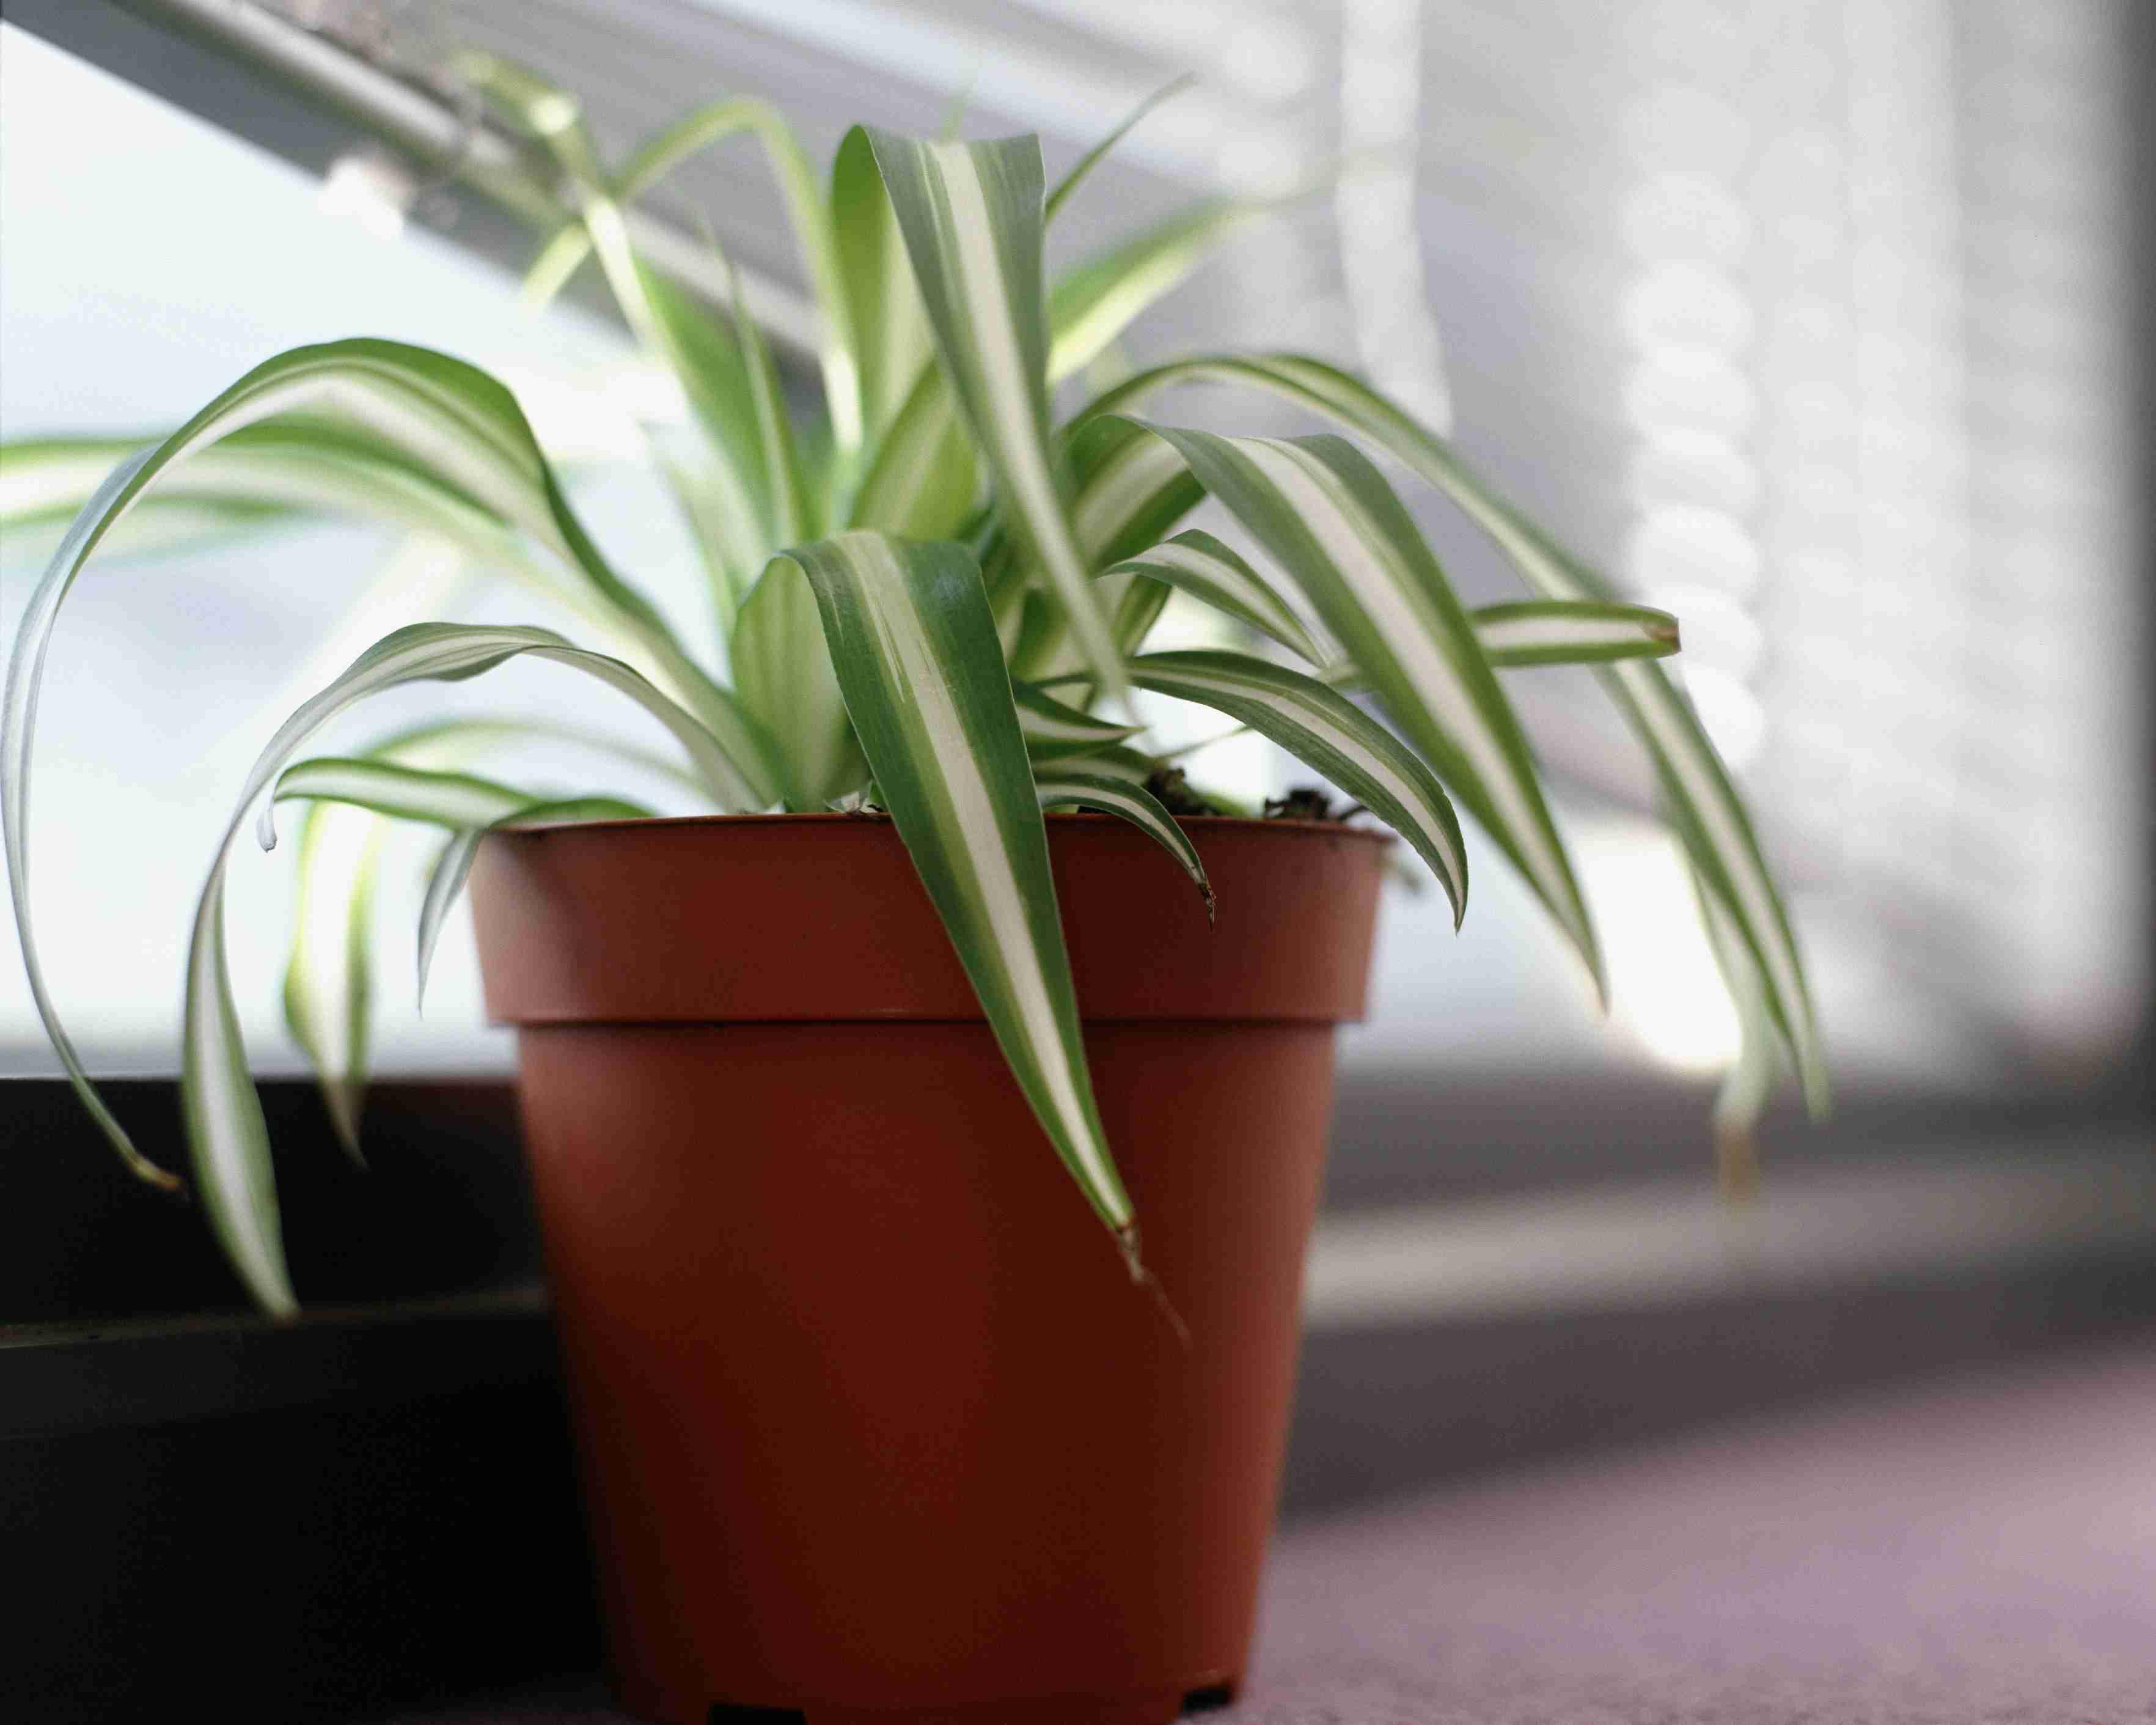 spider plant on windowsill 5b517b73c9e77c e1874